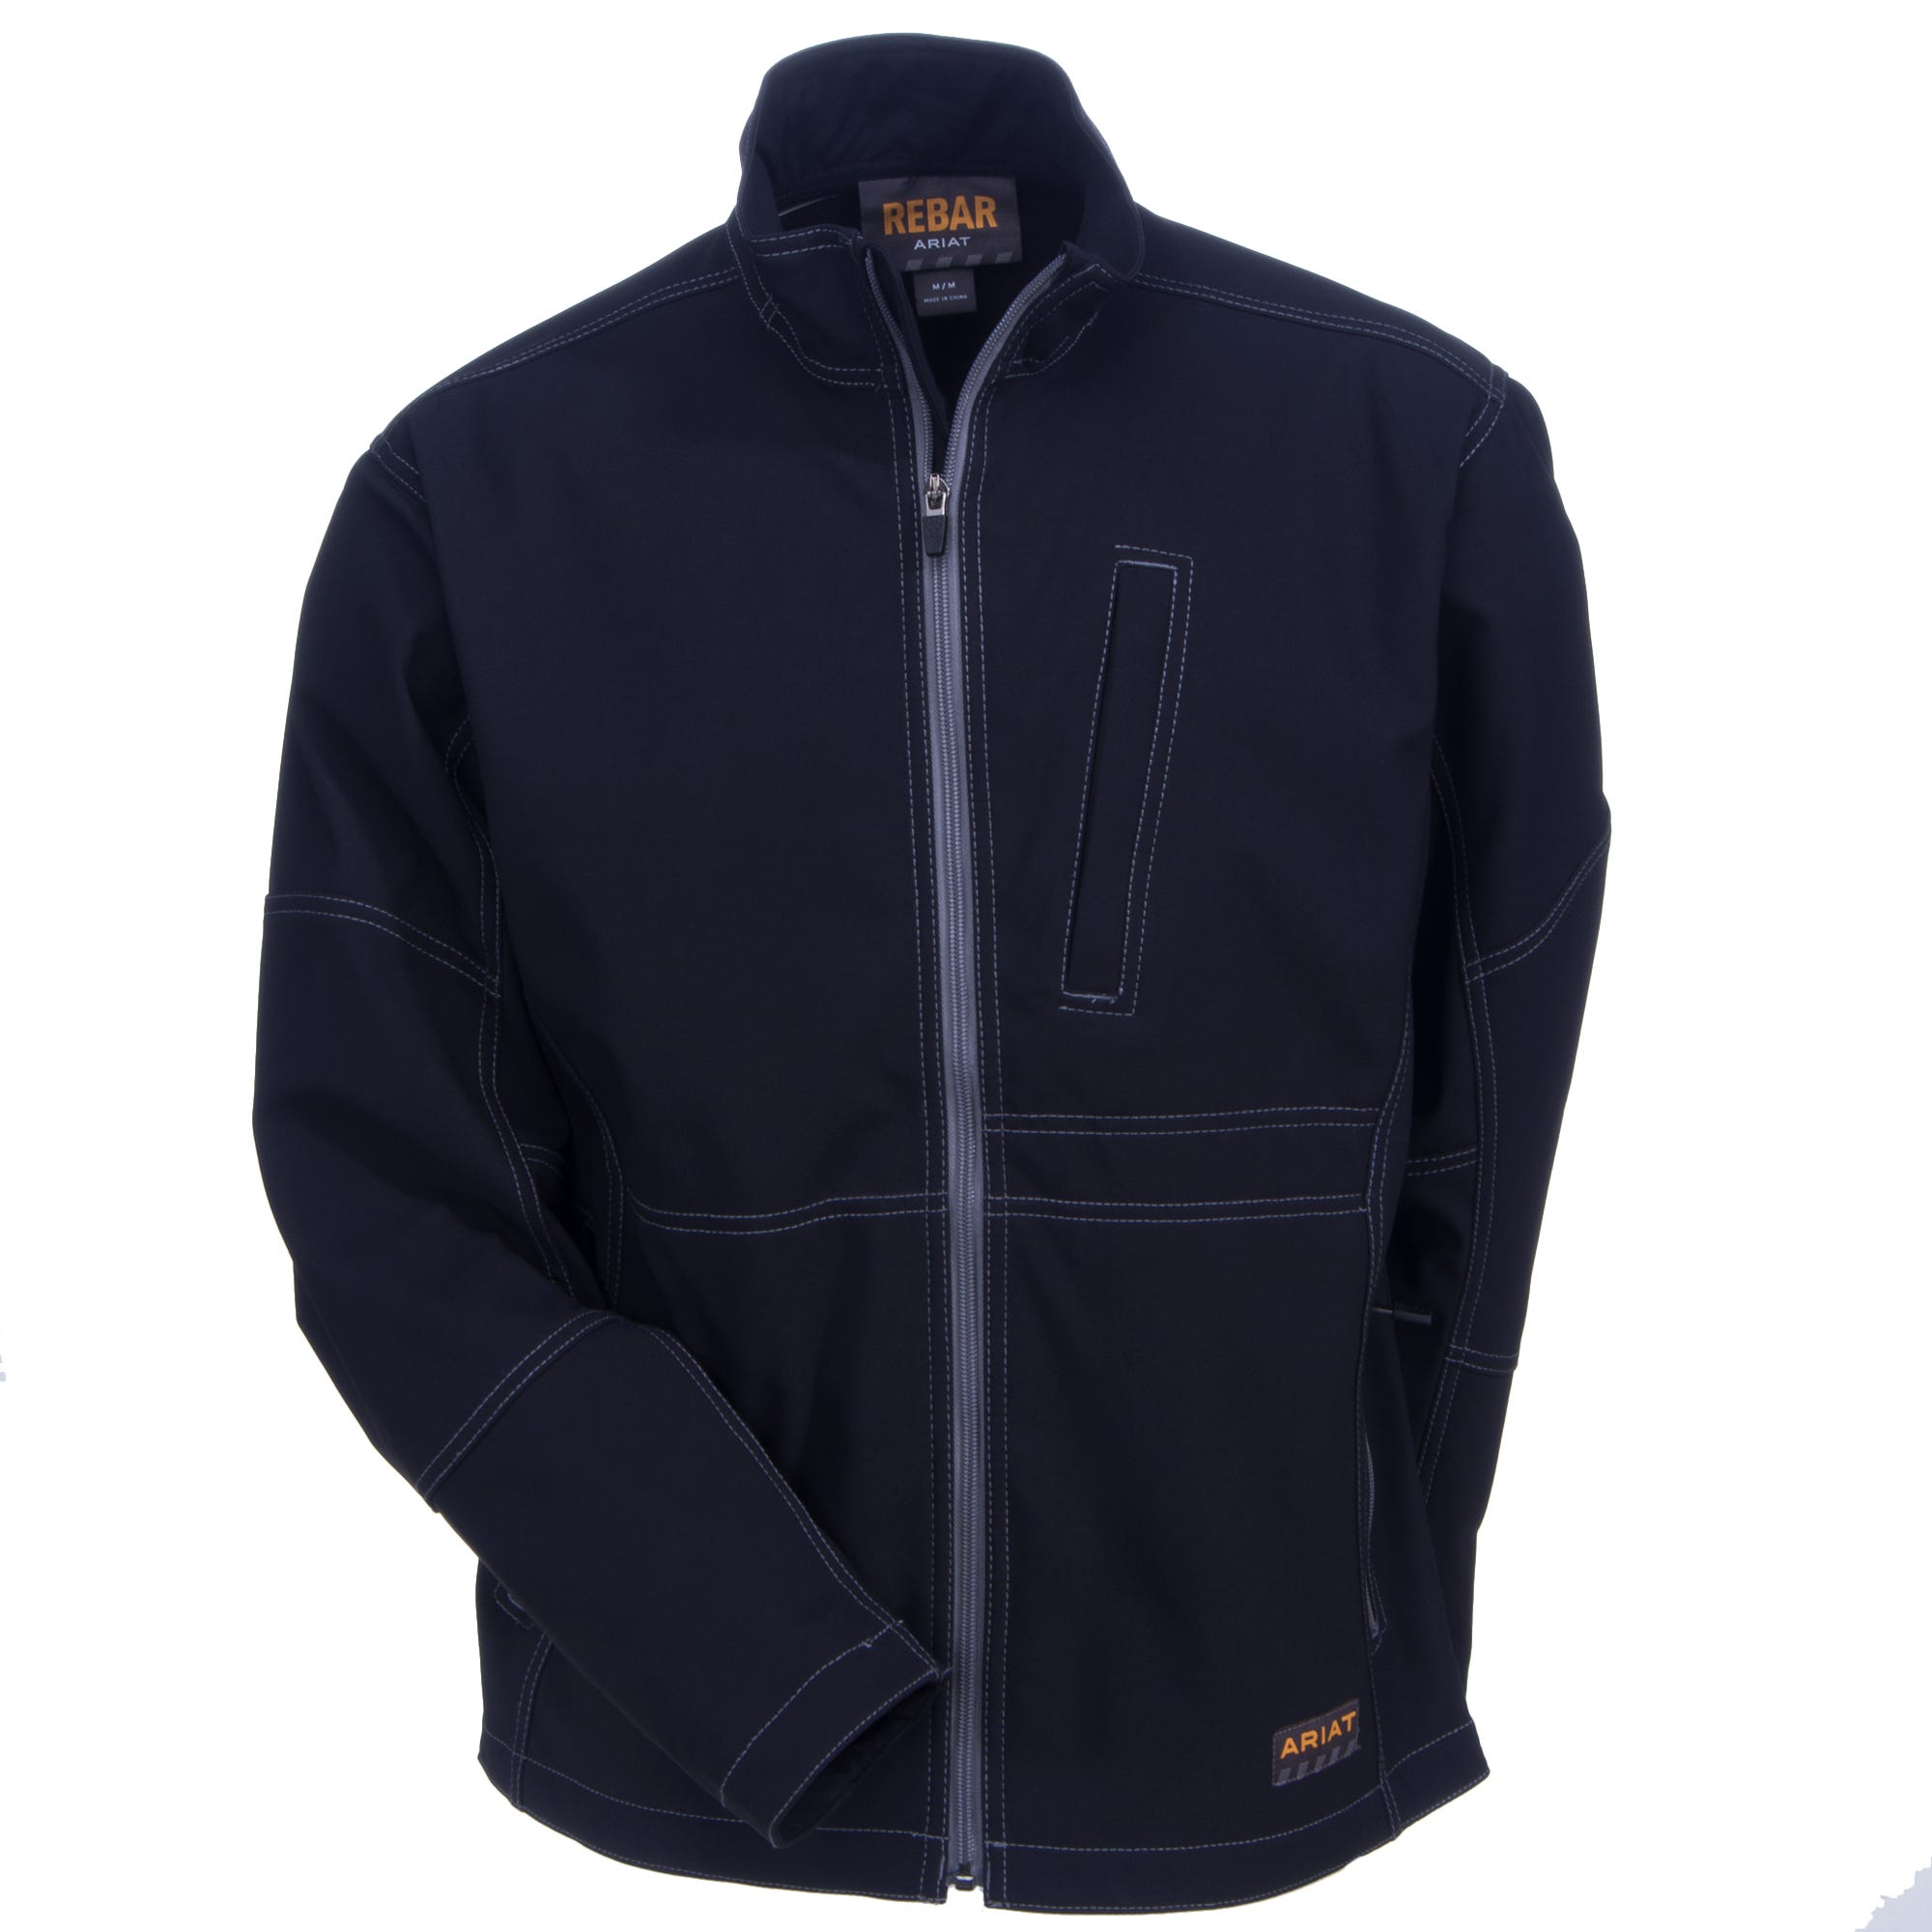 865c0a1d Ariat Workwear: Men's Rebar Black 10020777 Canvas Jacket - Apparel ...